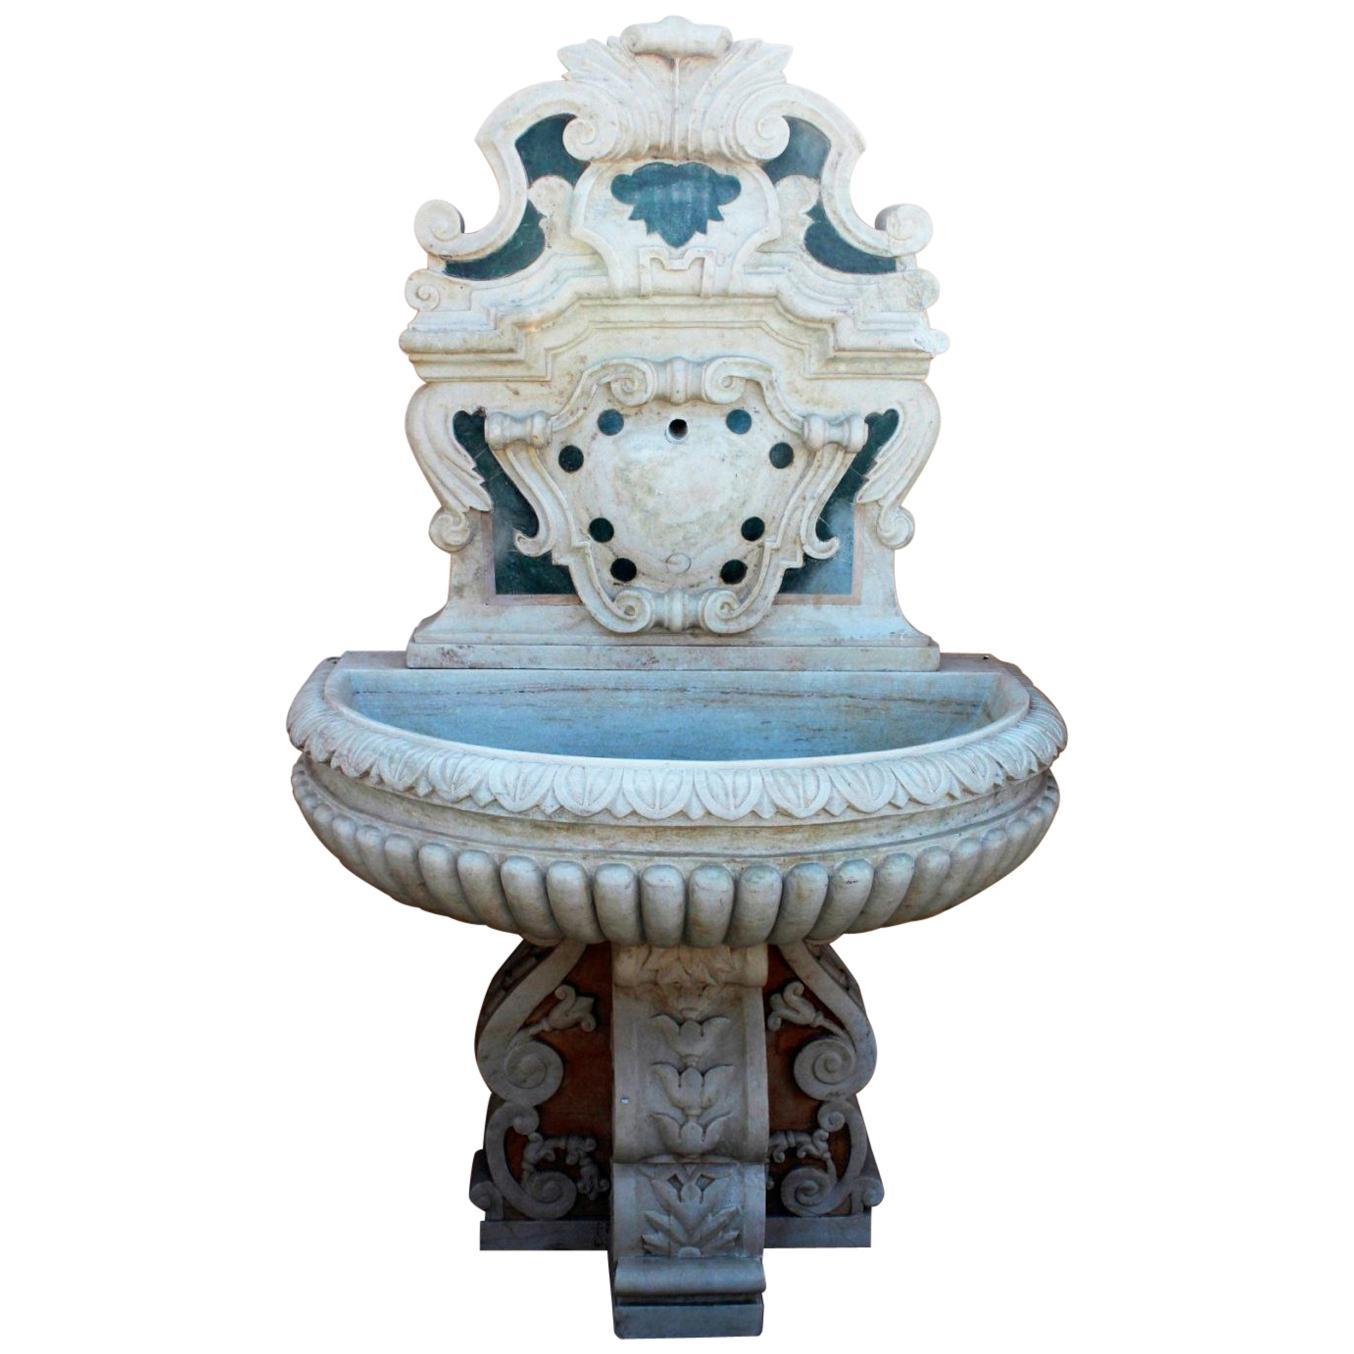 Italian Neoclassical Marble Inlay Wall Fountain